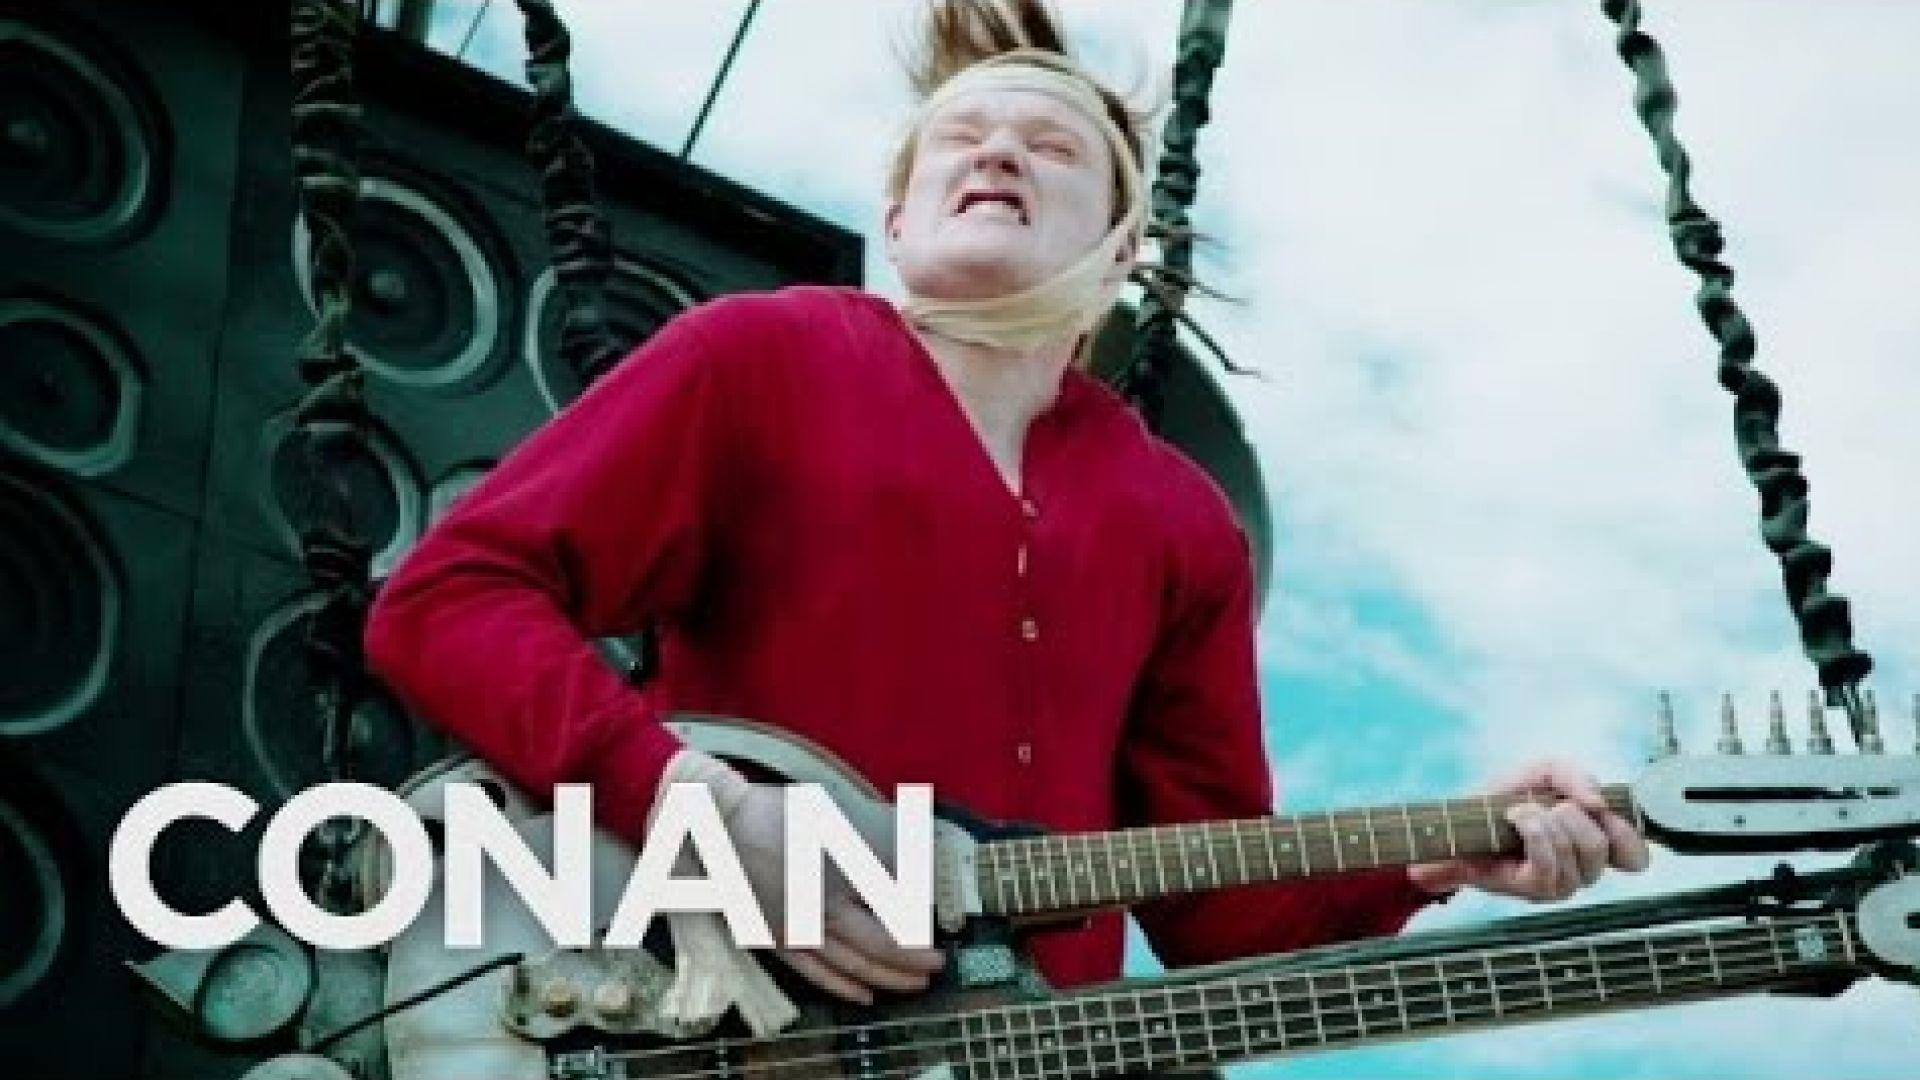 LOL Conan goes to Comic-Con Mad Max-Style